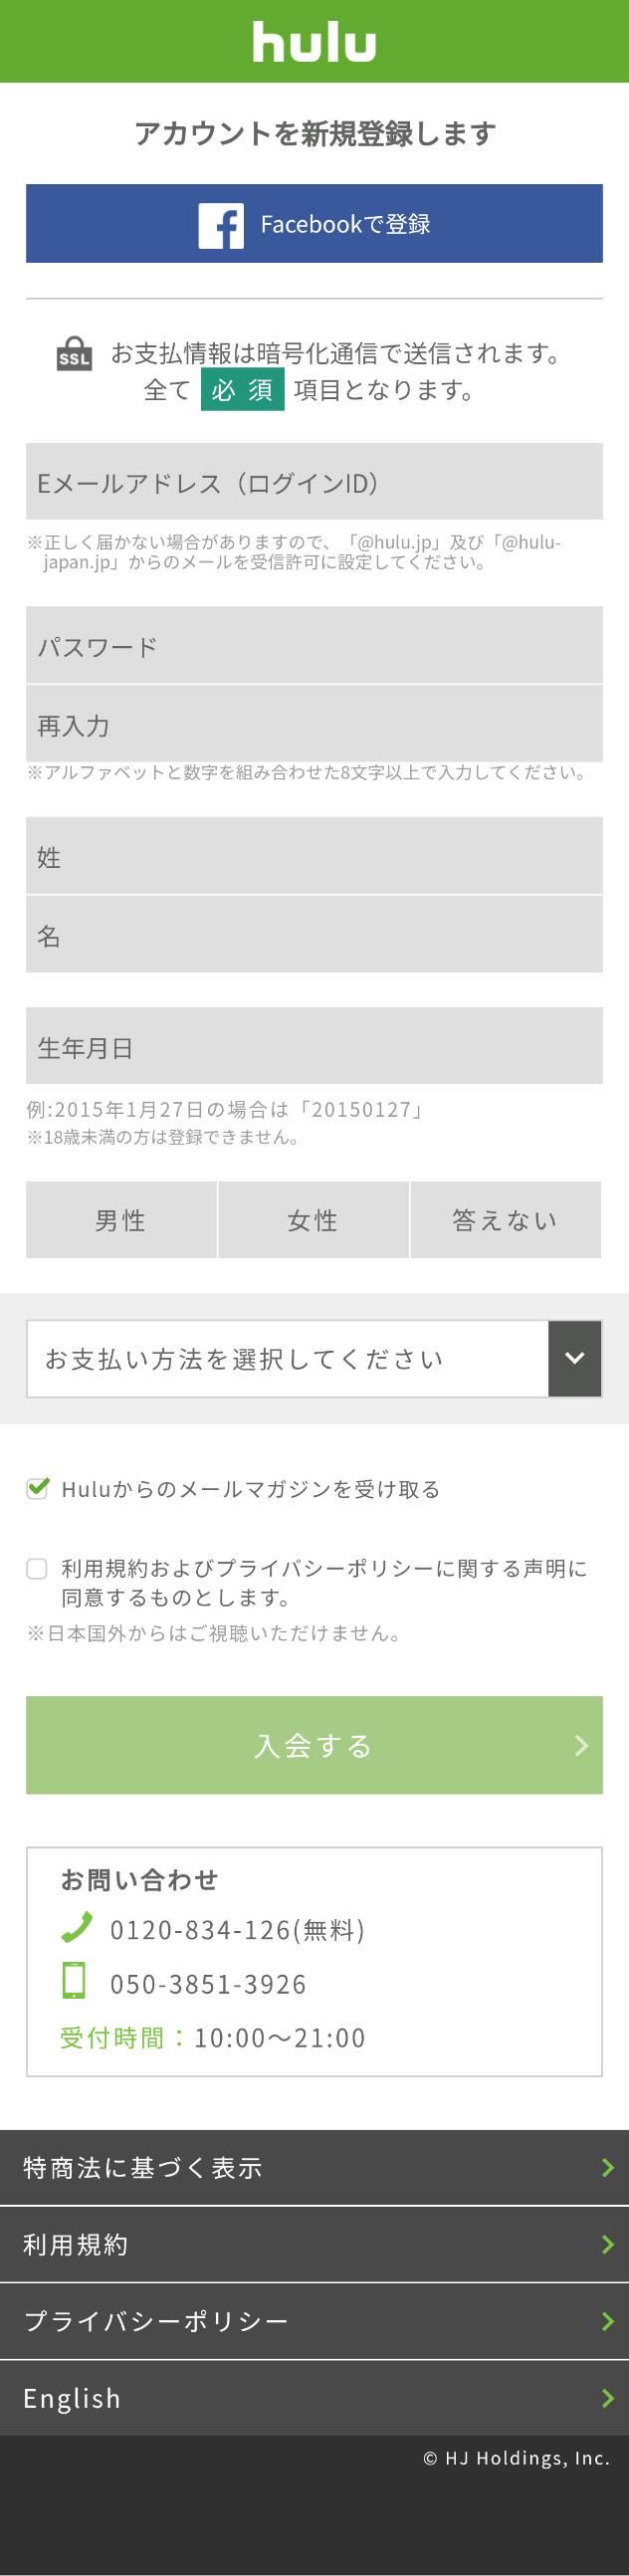 huluの登録方法(PC・スマホ)